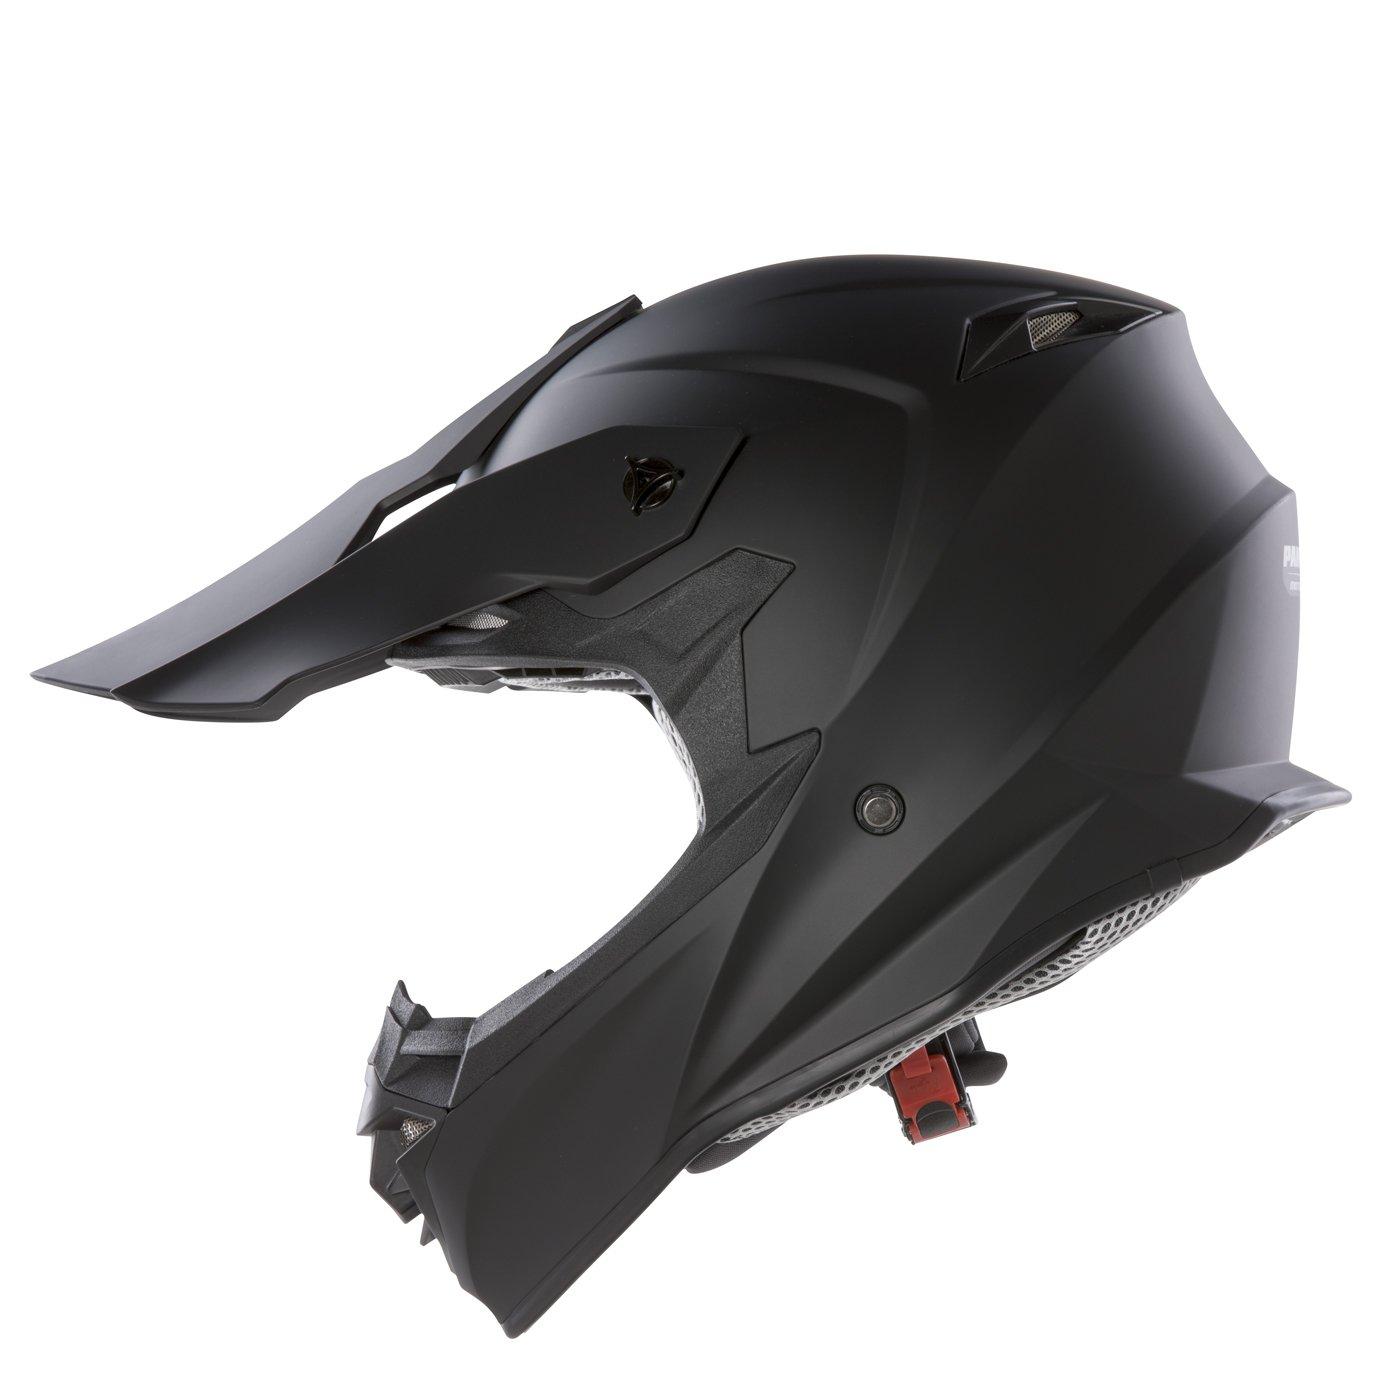 Panthera Moto Cross FS607 - Casco de moto, Negro Mate, M: Amazon.es: Coche y moto